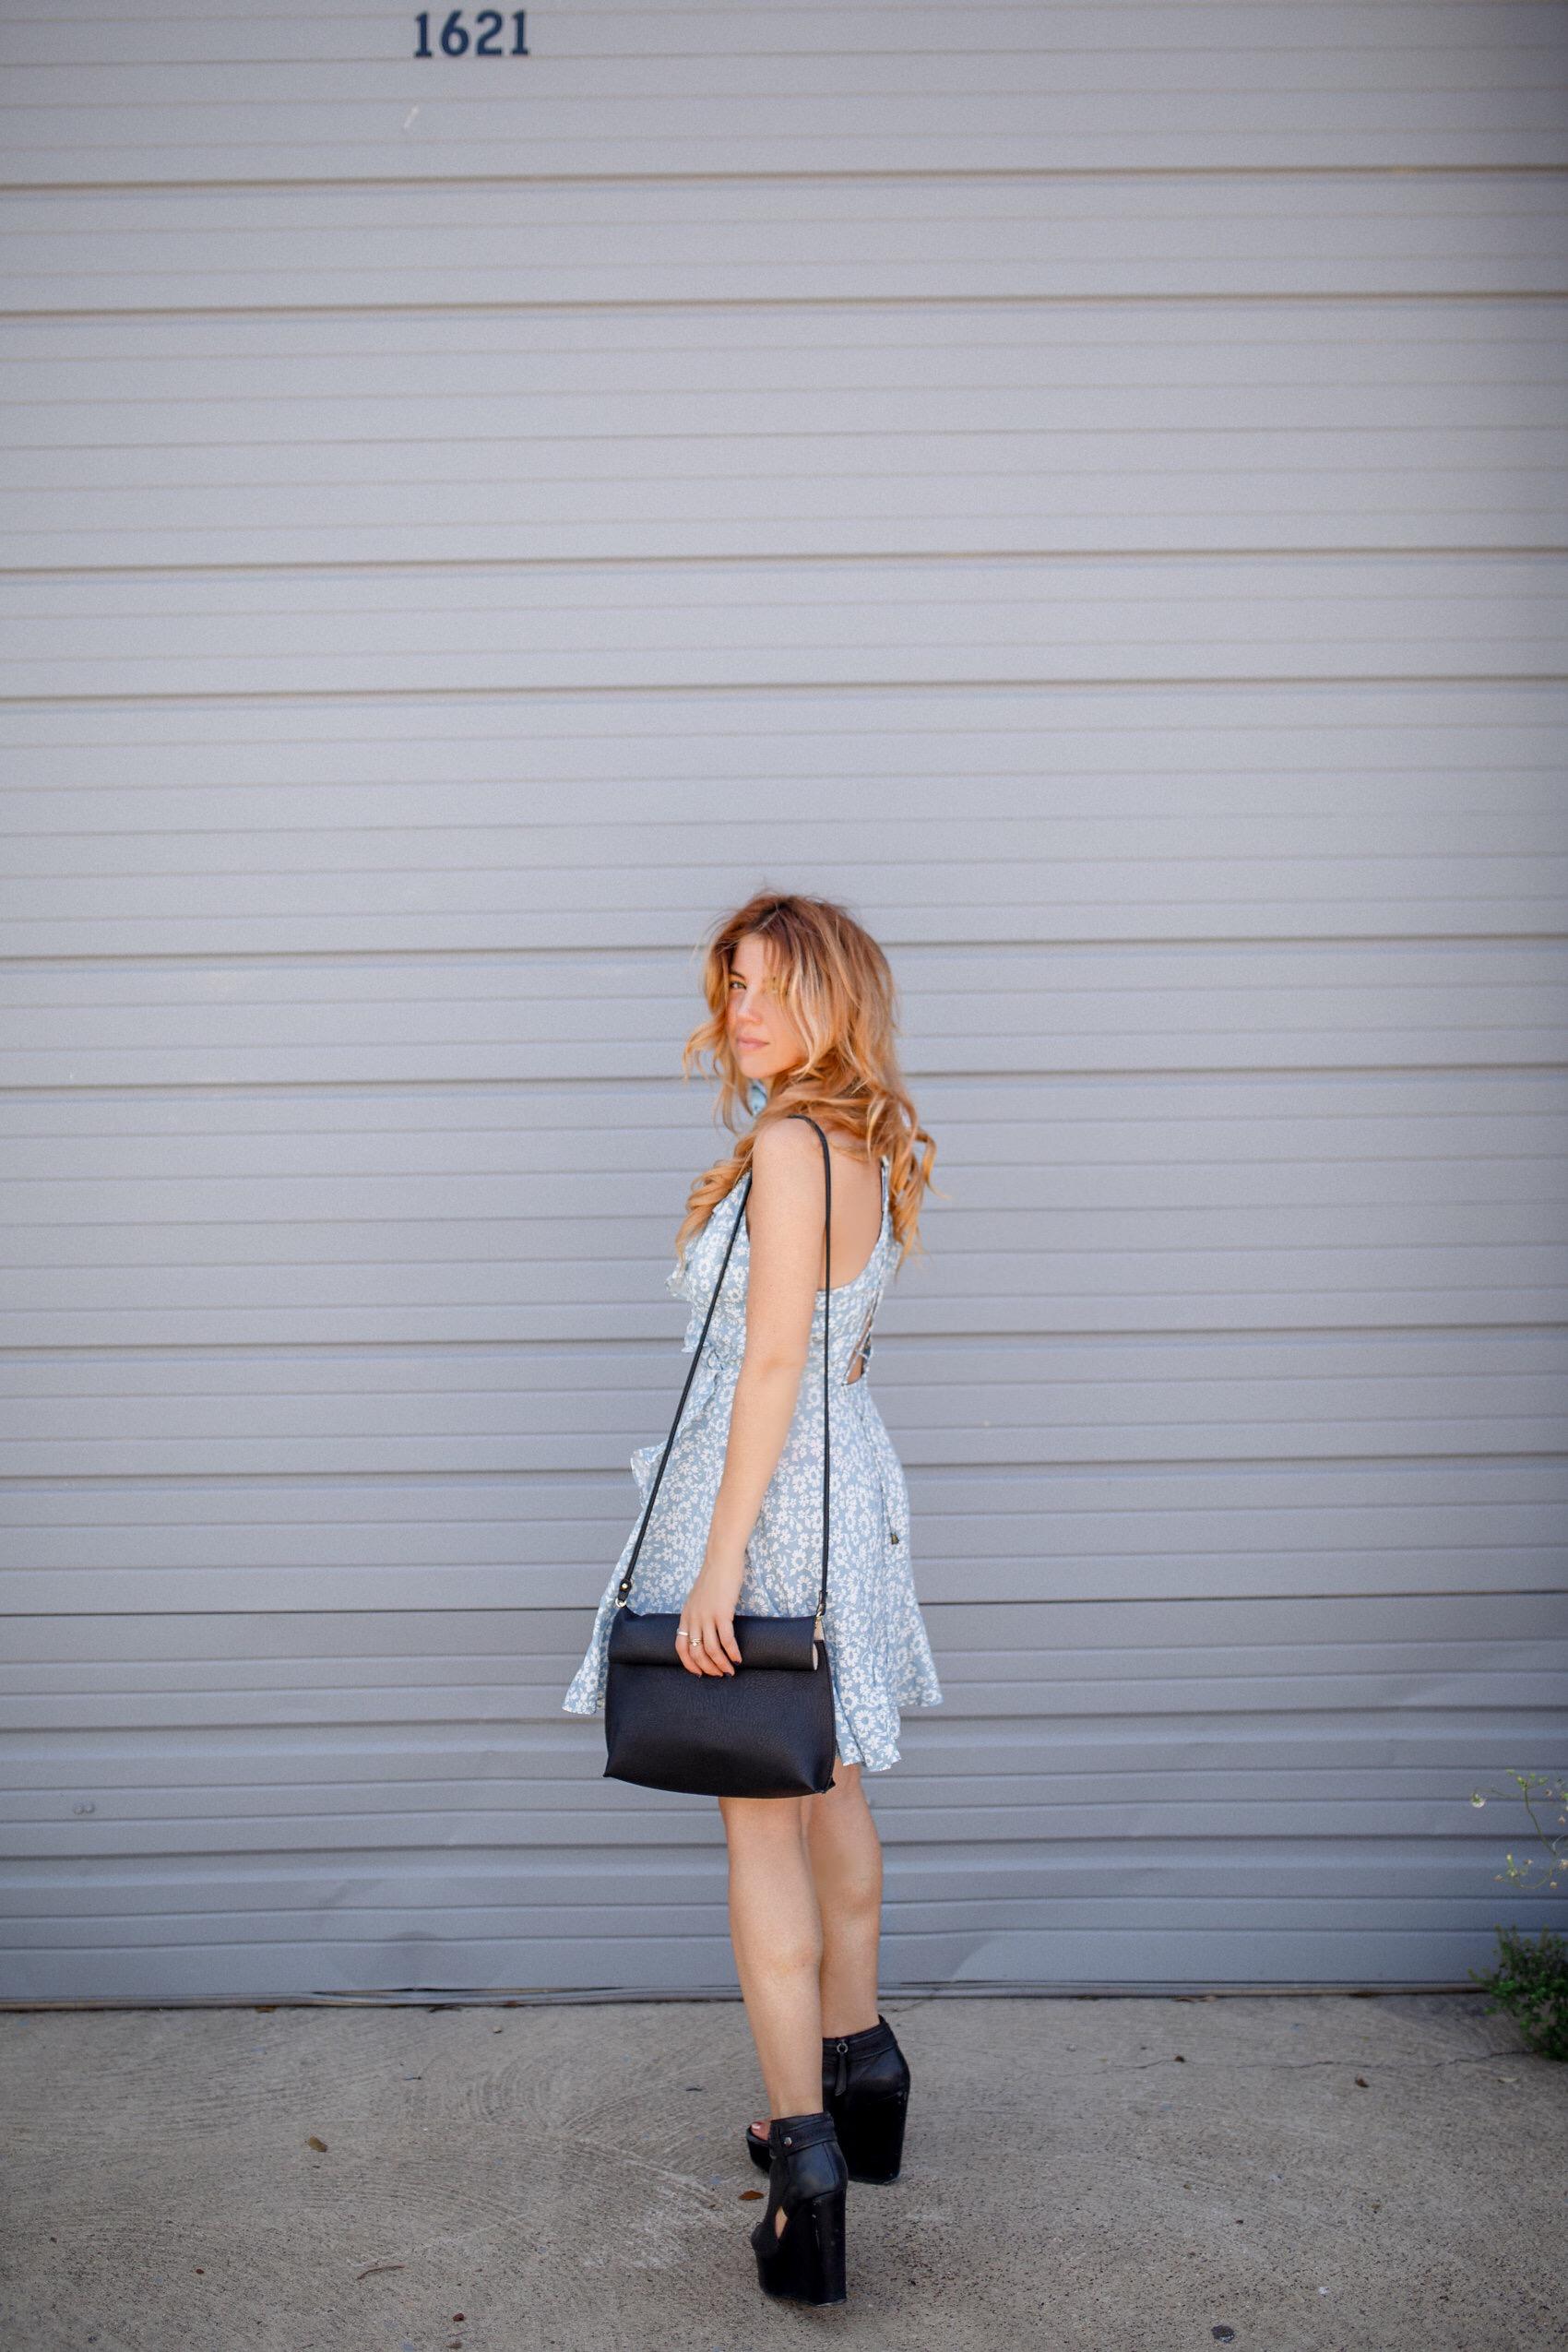 urban outfitters vegan leather crossbody bag, dress on sale, fashionveggie vegan fashion blogger